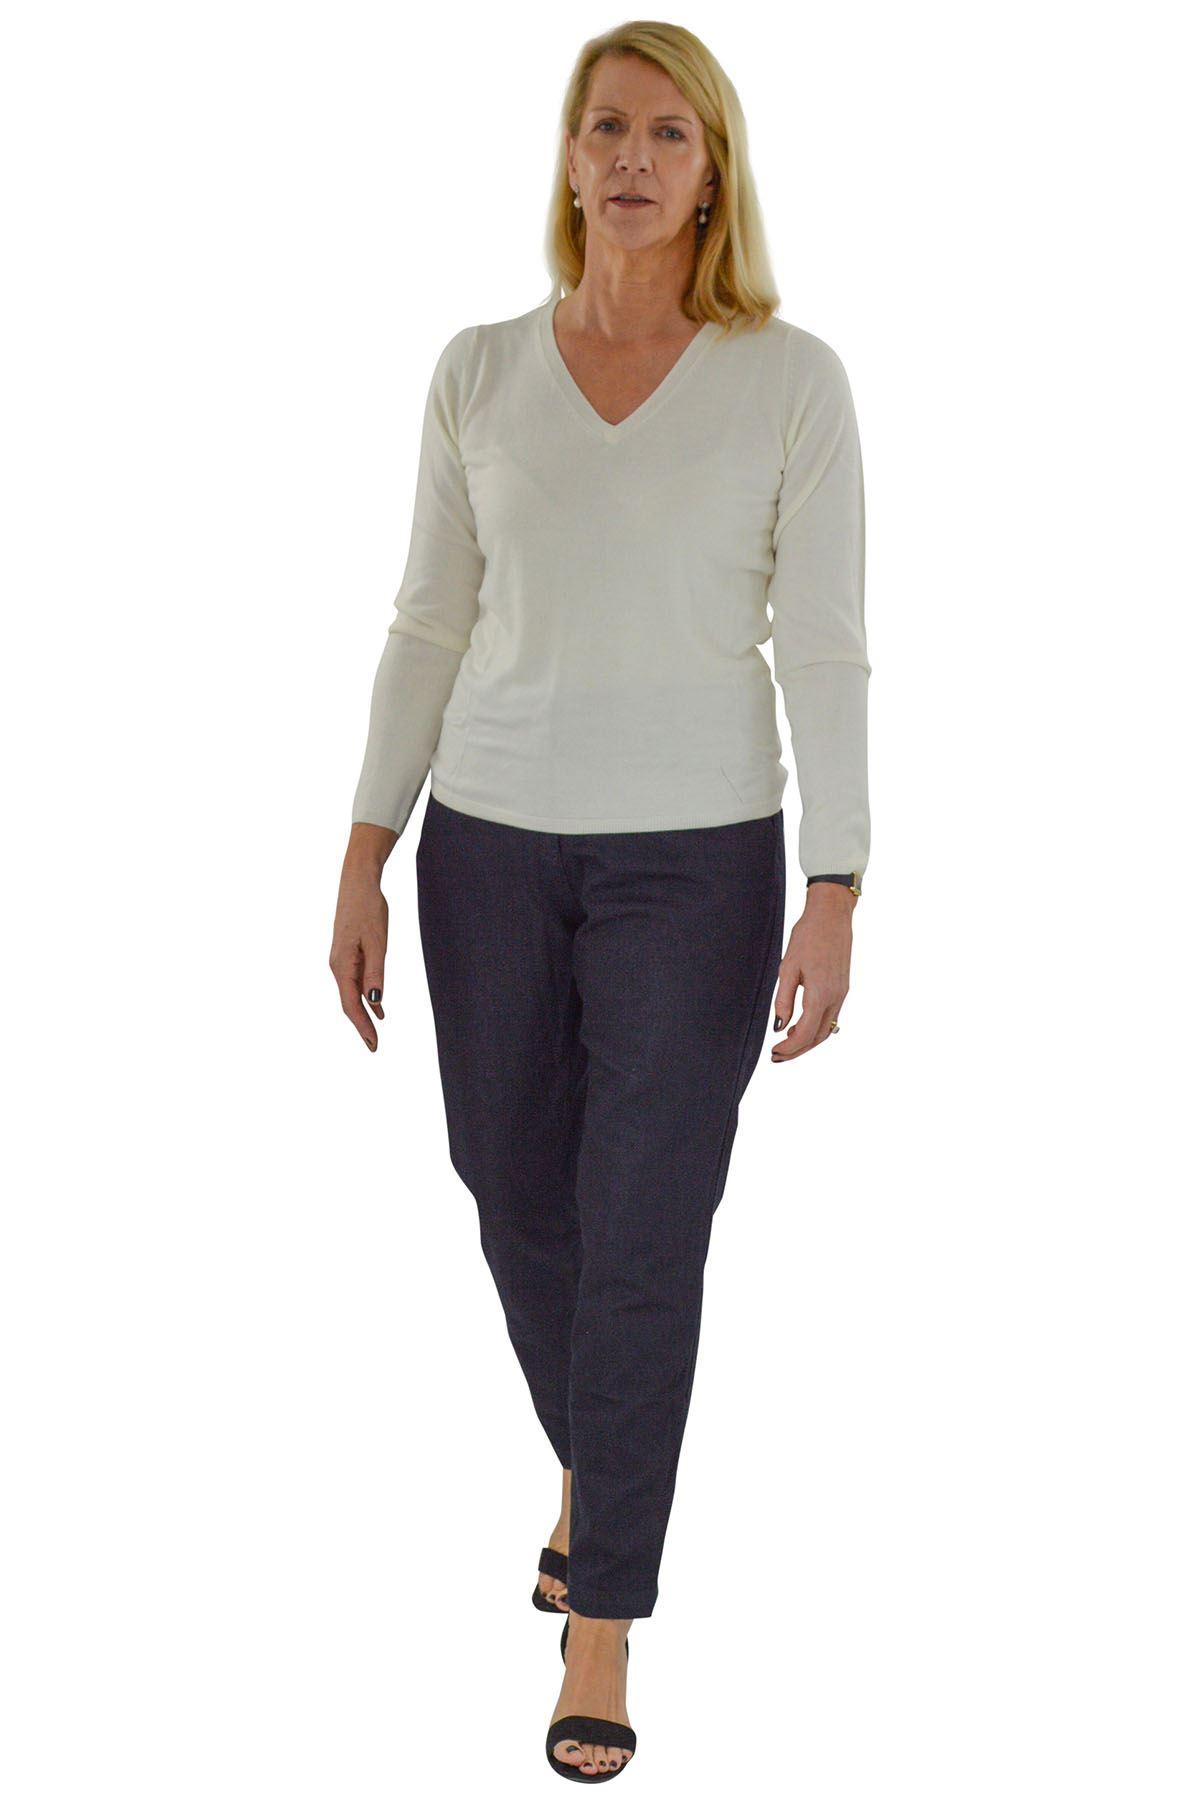 NEXT Ladies Dark Navy Work Trousers Classic Ankle Taper ShapeSALEWas £25